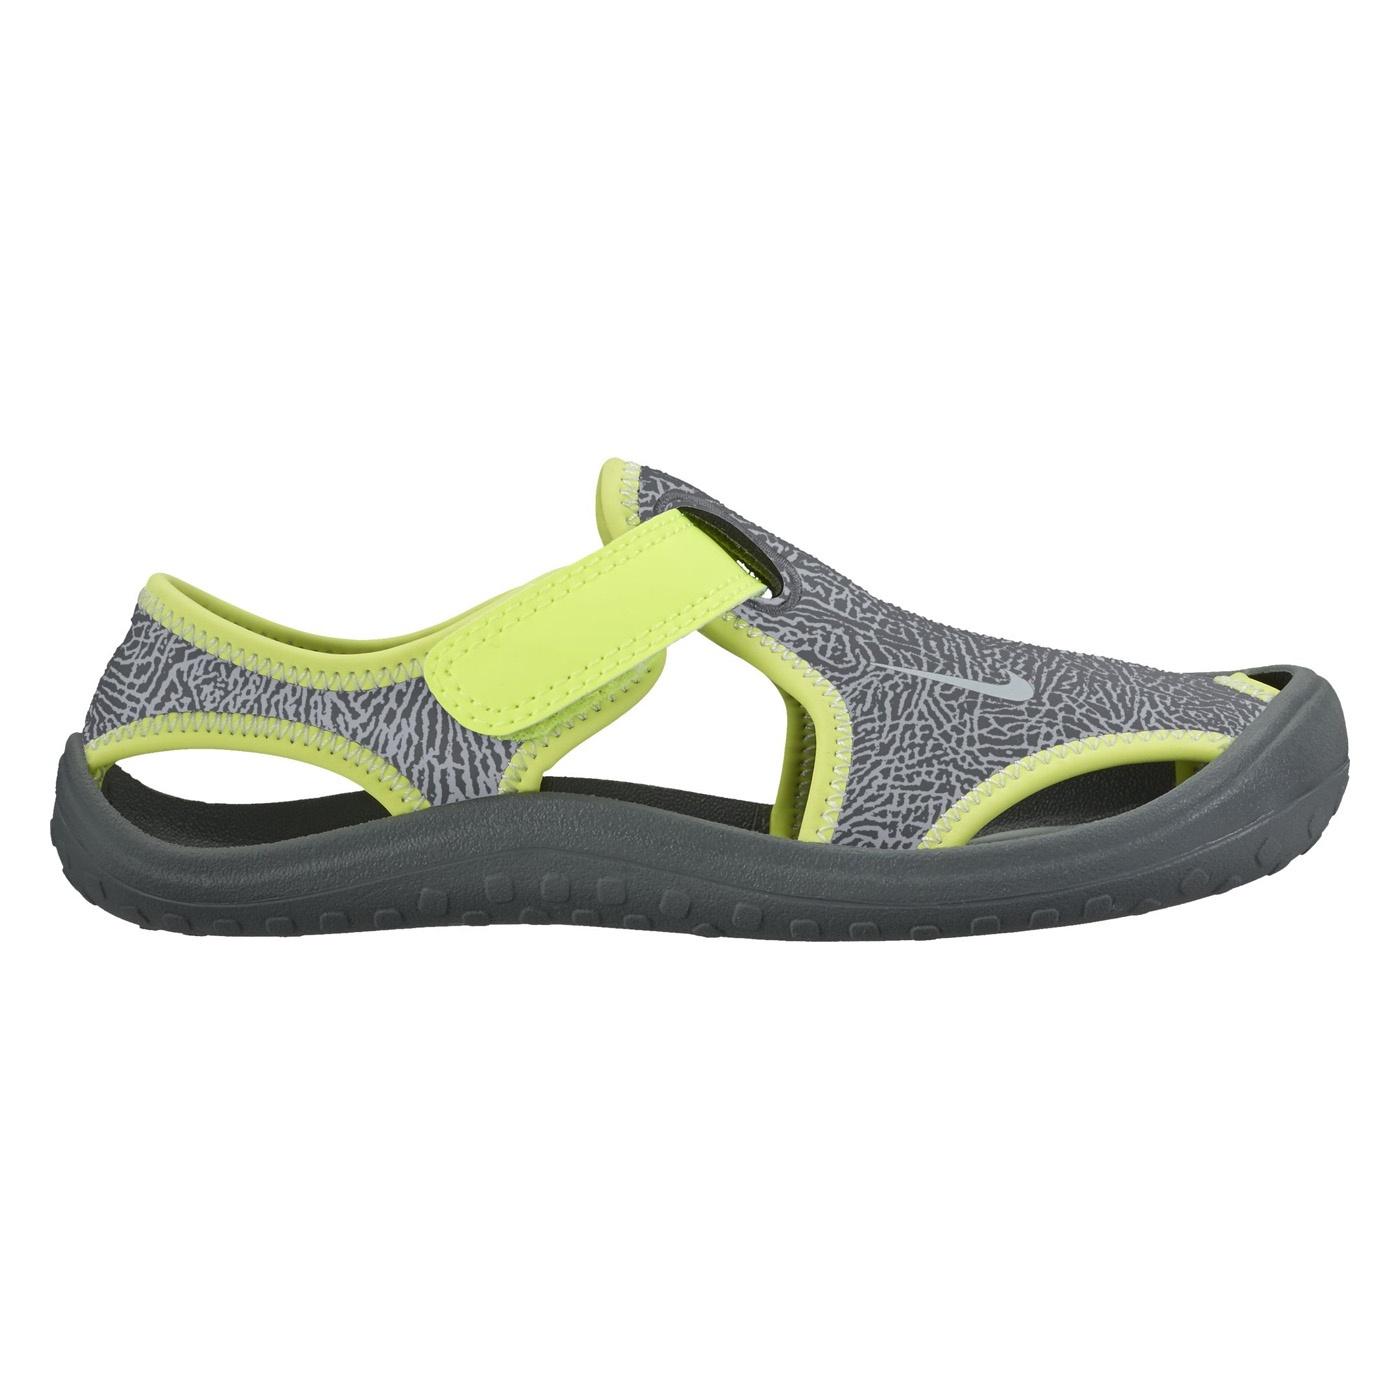 Juniorskie sandały Nike sunray protect @ Martes Sport